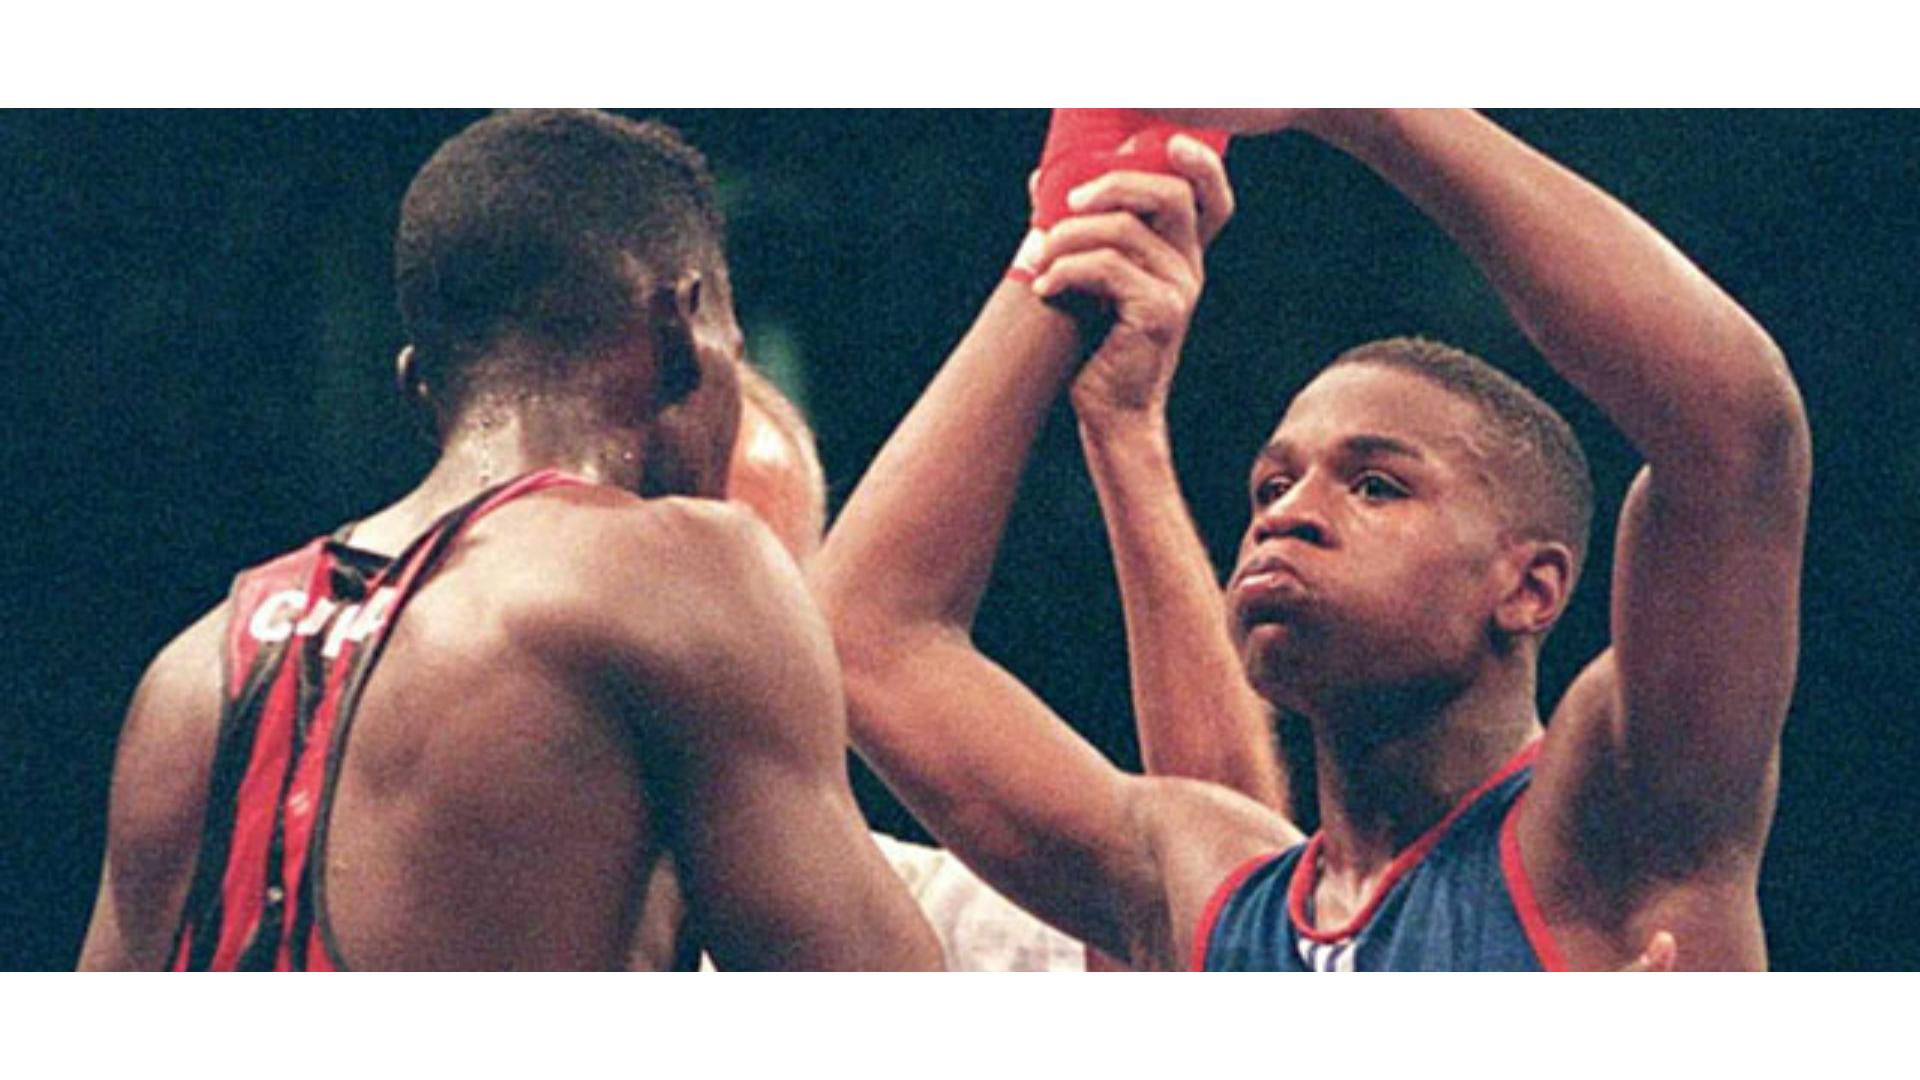 1996 Atlanta Olimpiyatı'ndan bir görsel.